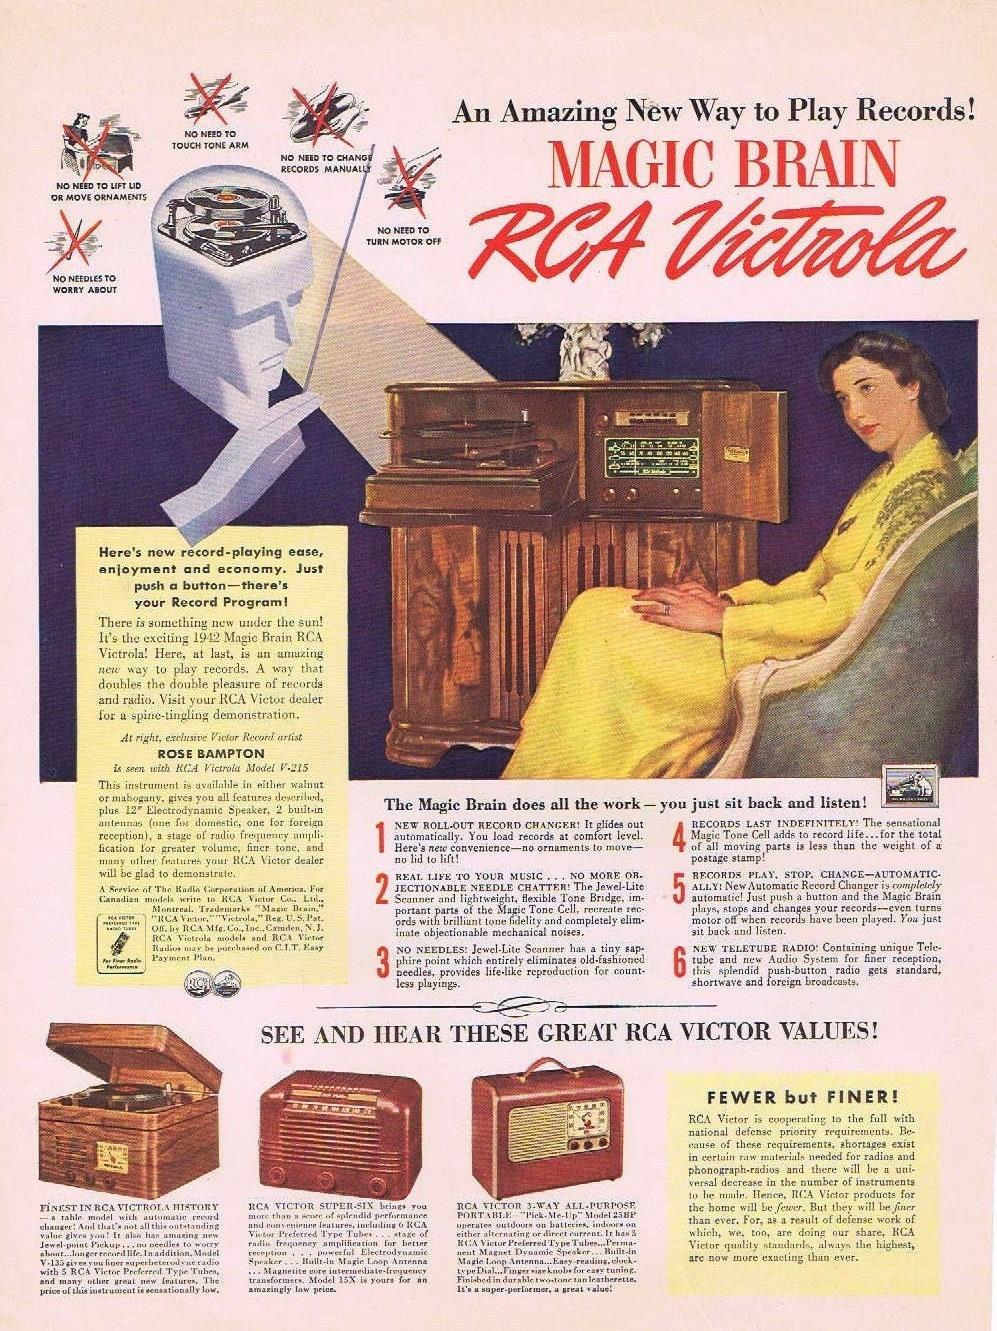 1942 RCA Magic Brain Victrola Record Player Vintage Ad with Rose Bampton